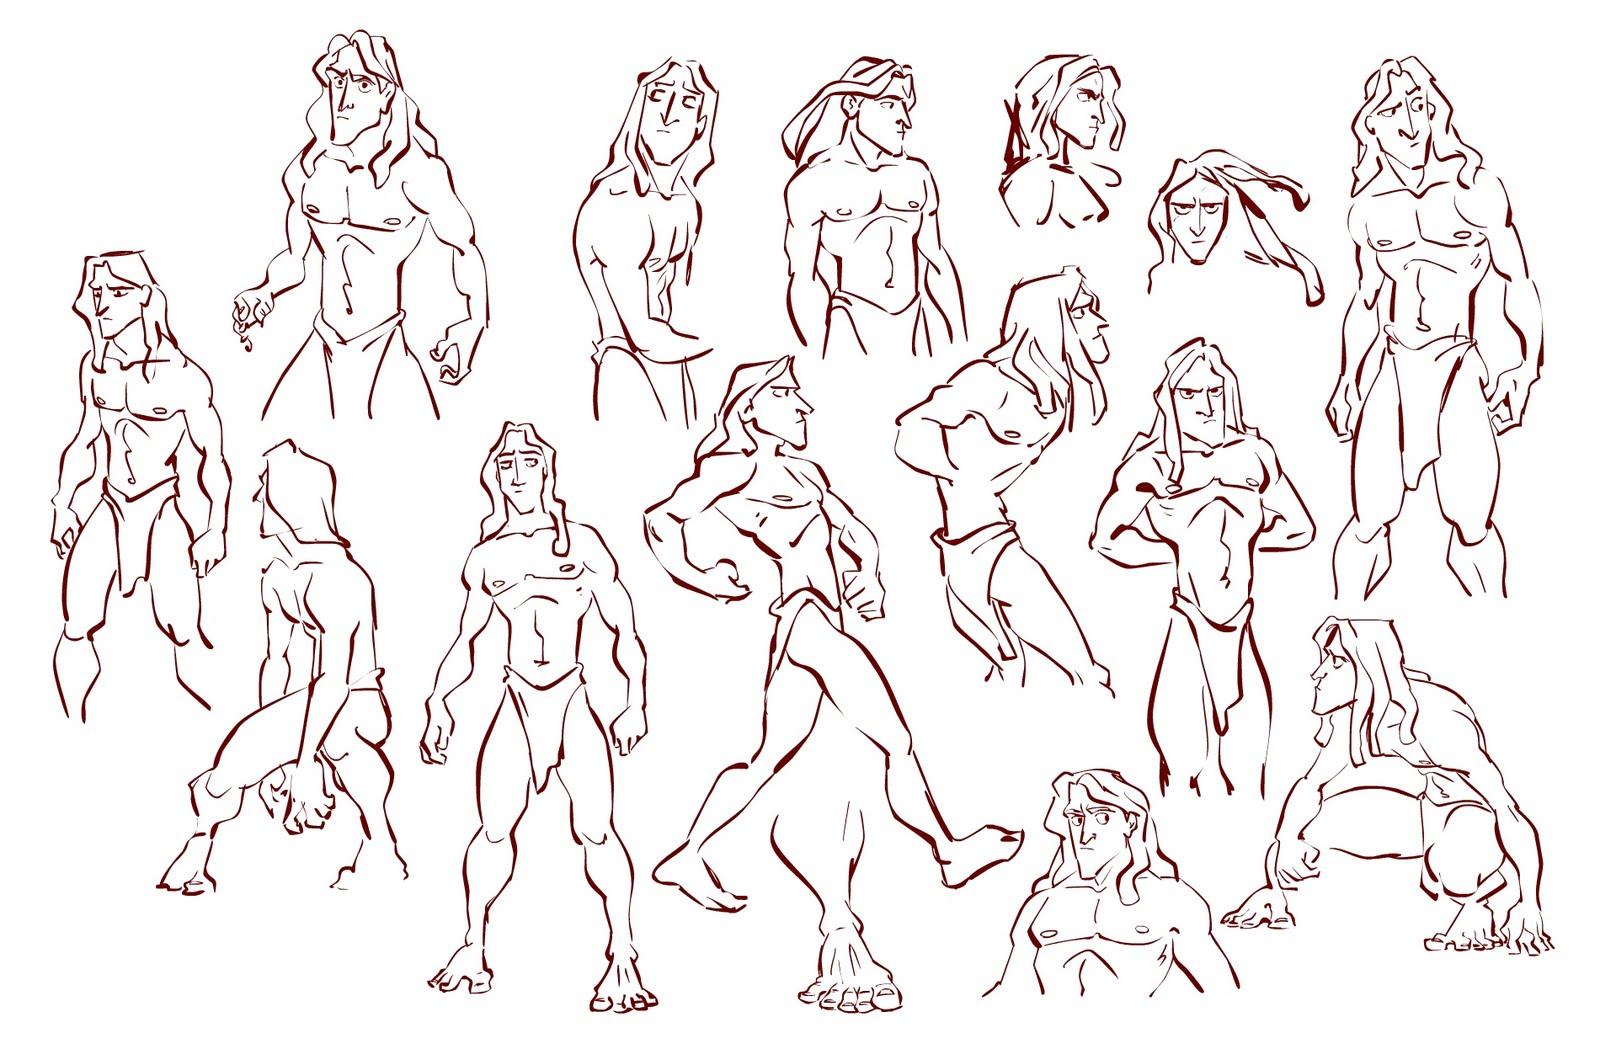 Disney Character Design Tarzan : Aleina june